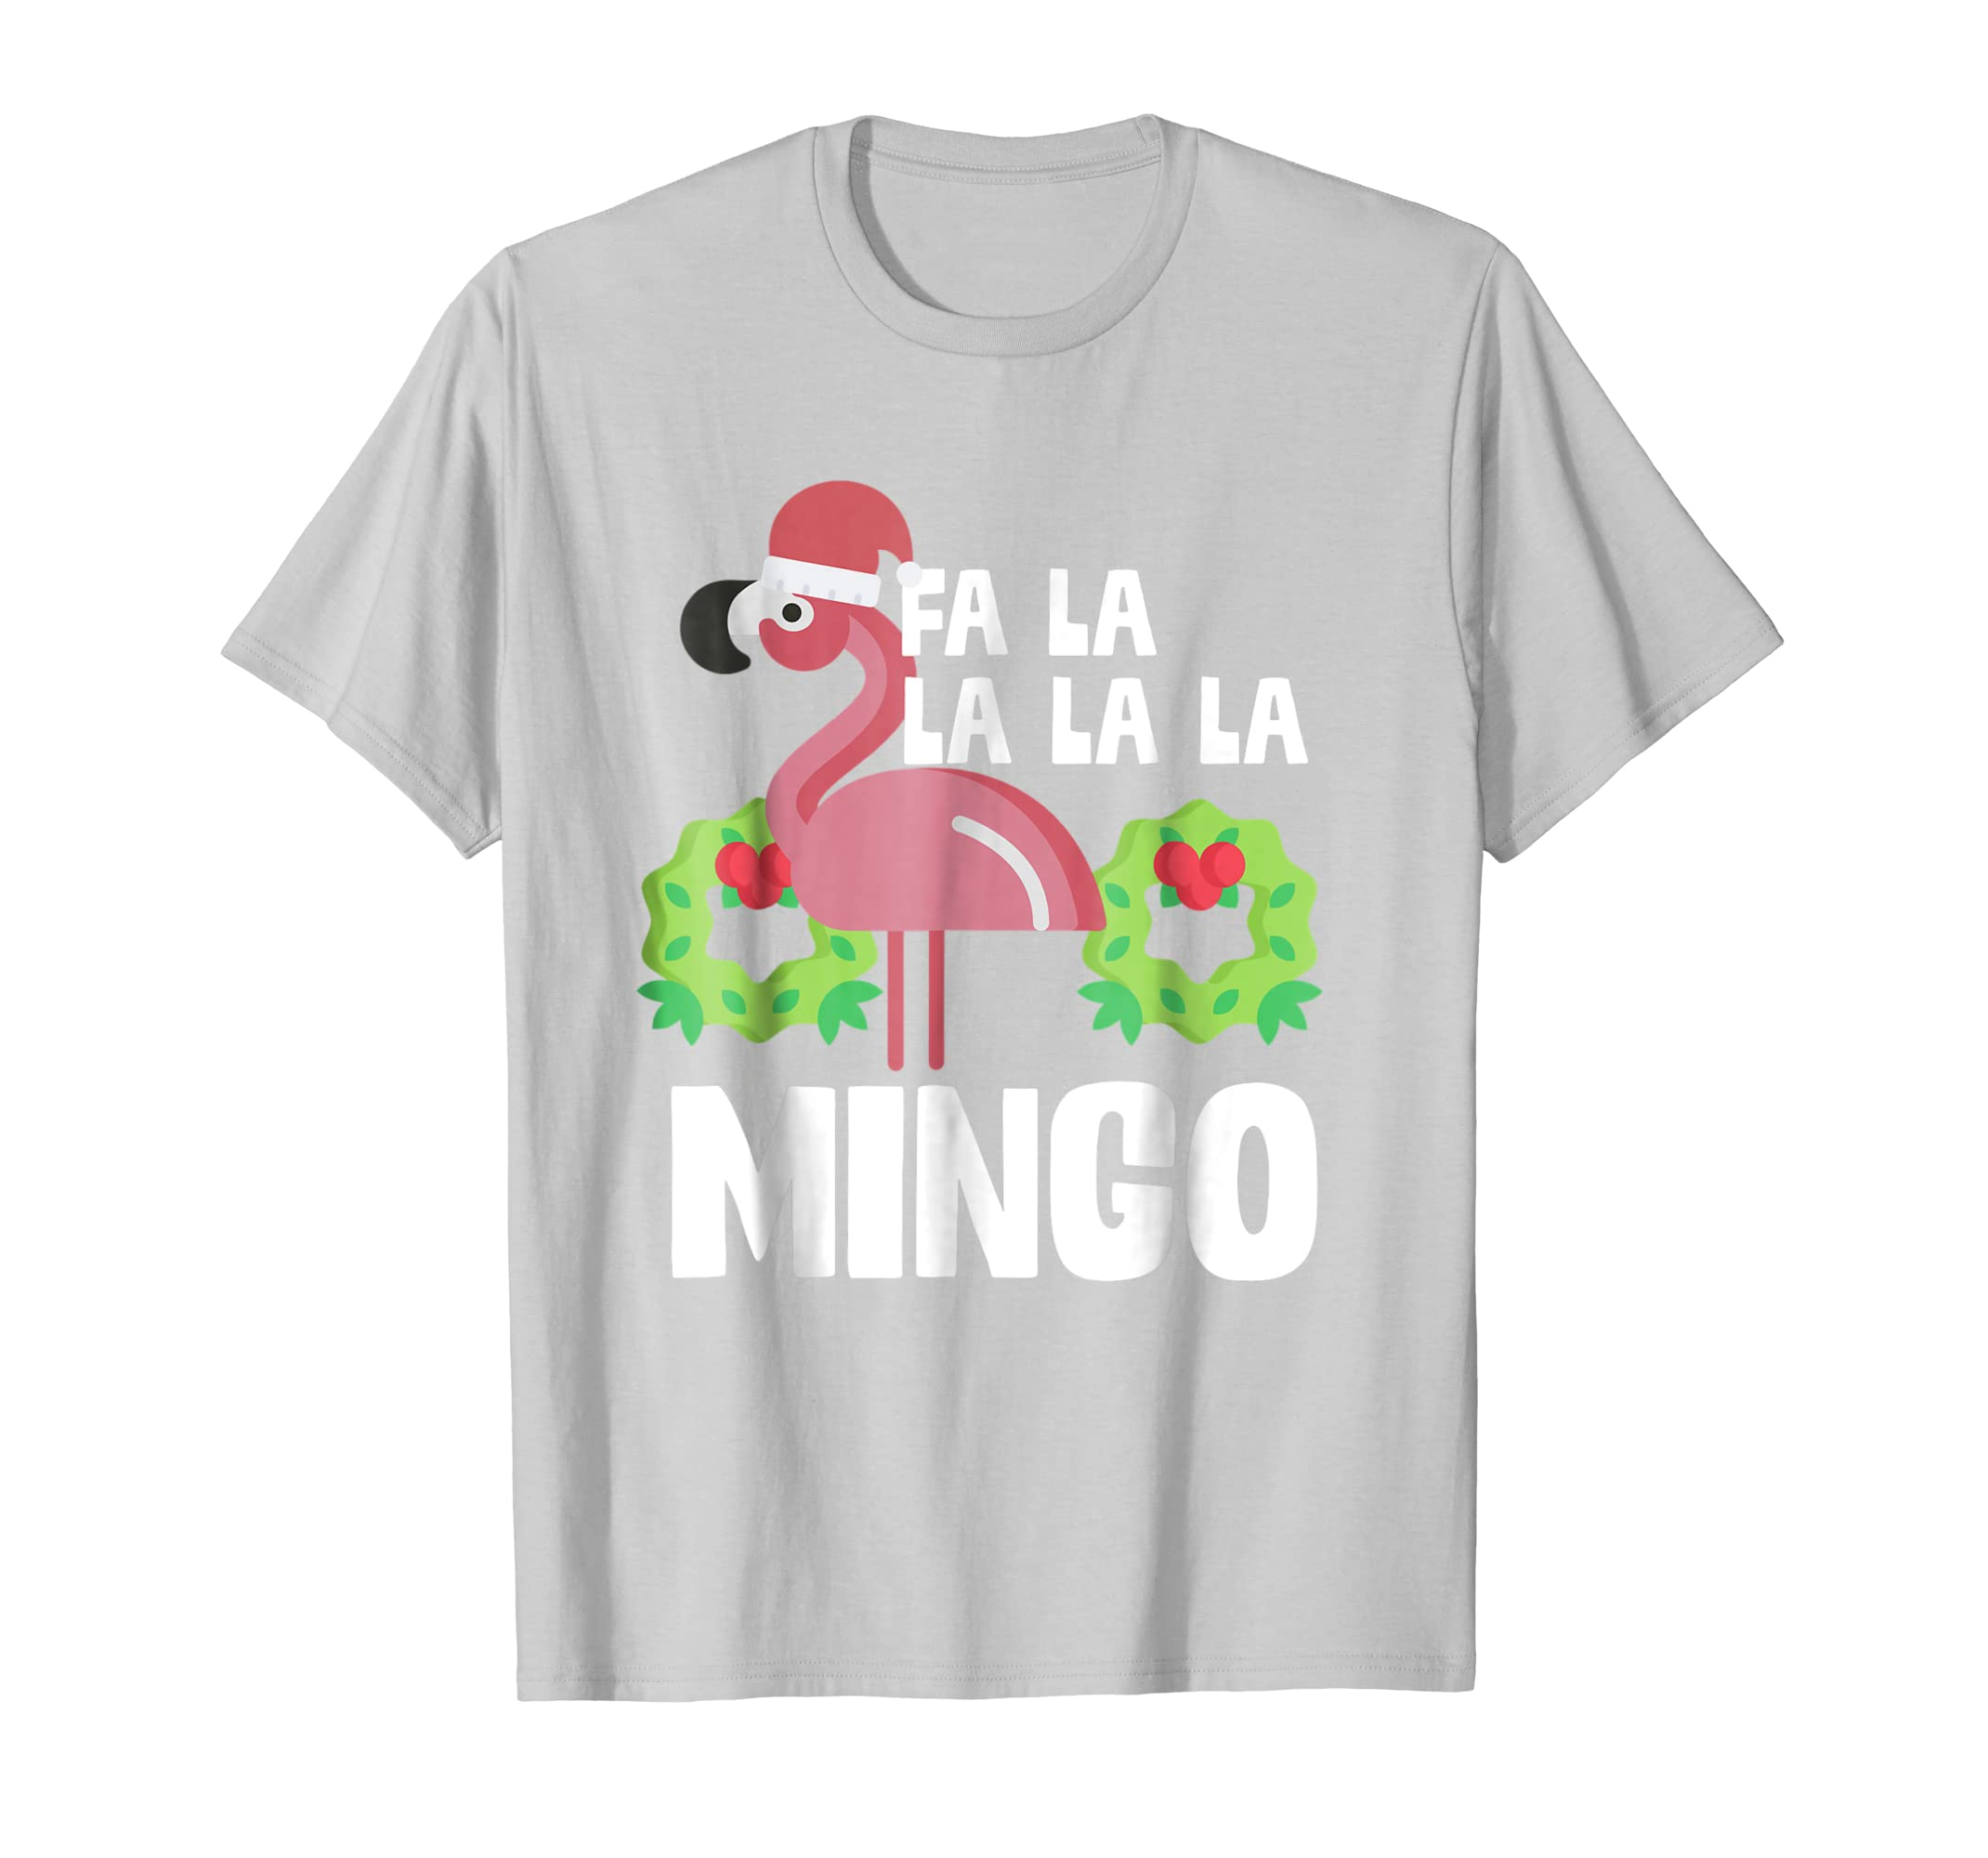 993ae769d Amazon.com: Fa La La Mingo Santa Christmas Flamingo Shirt: Clothing